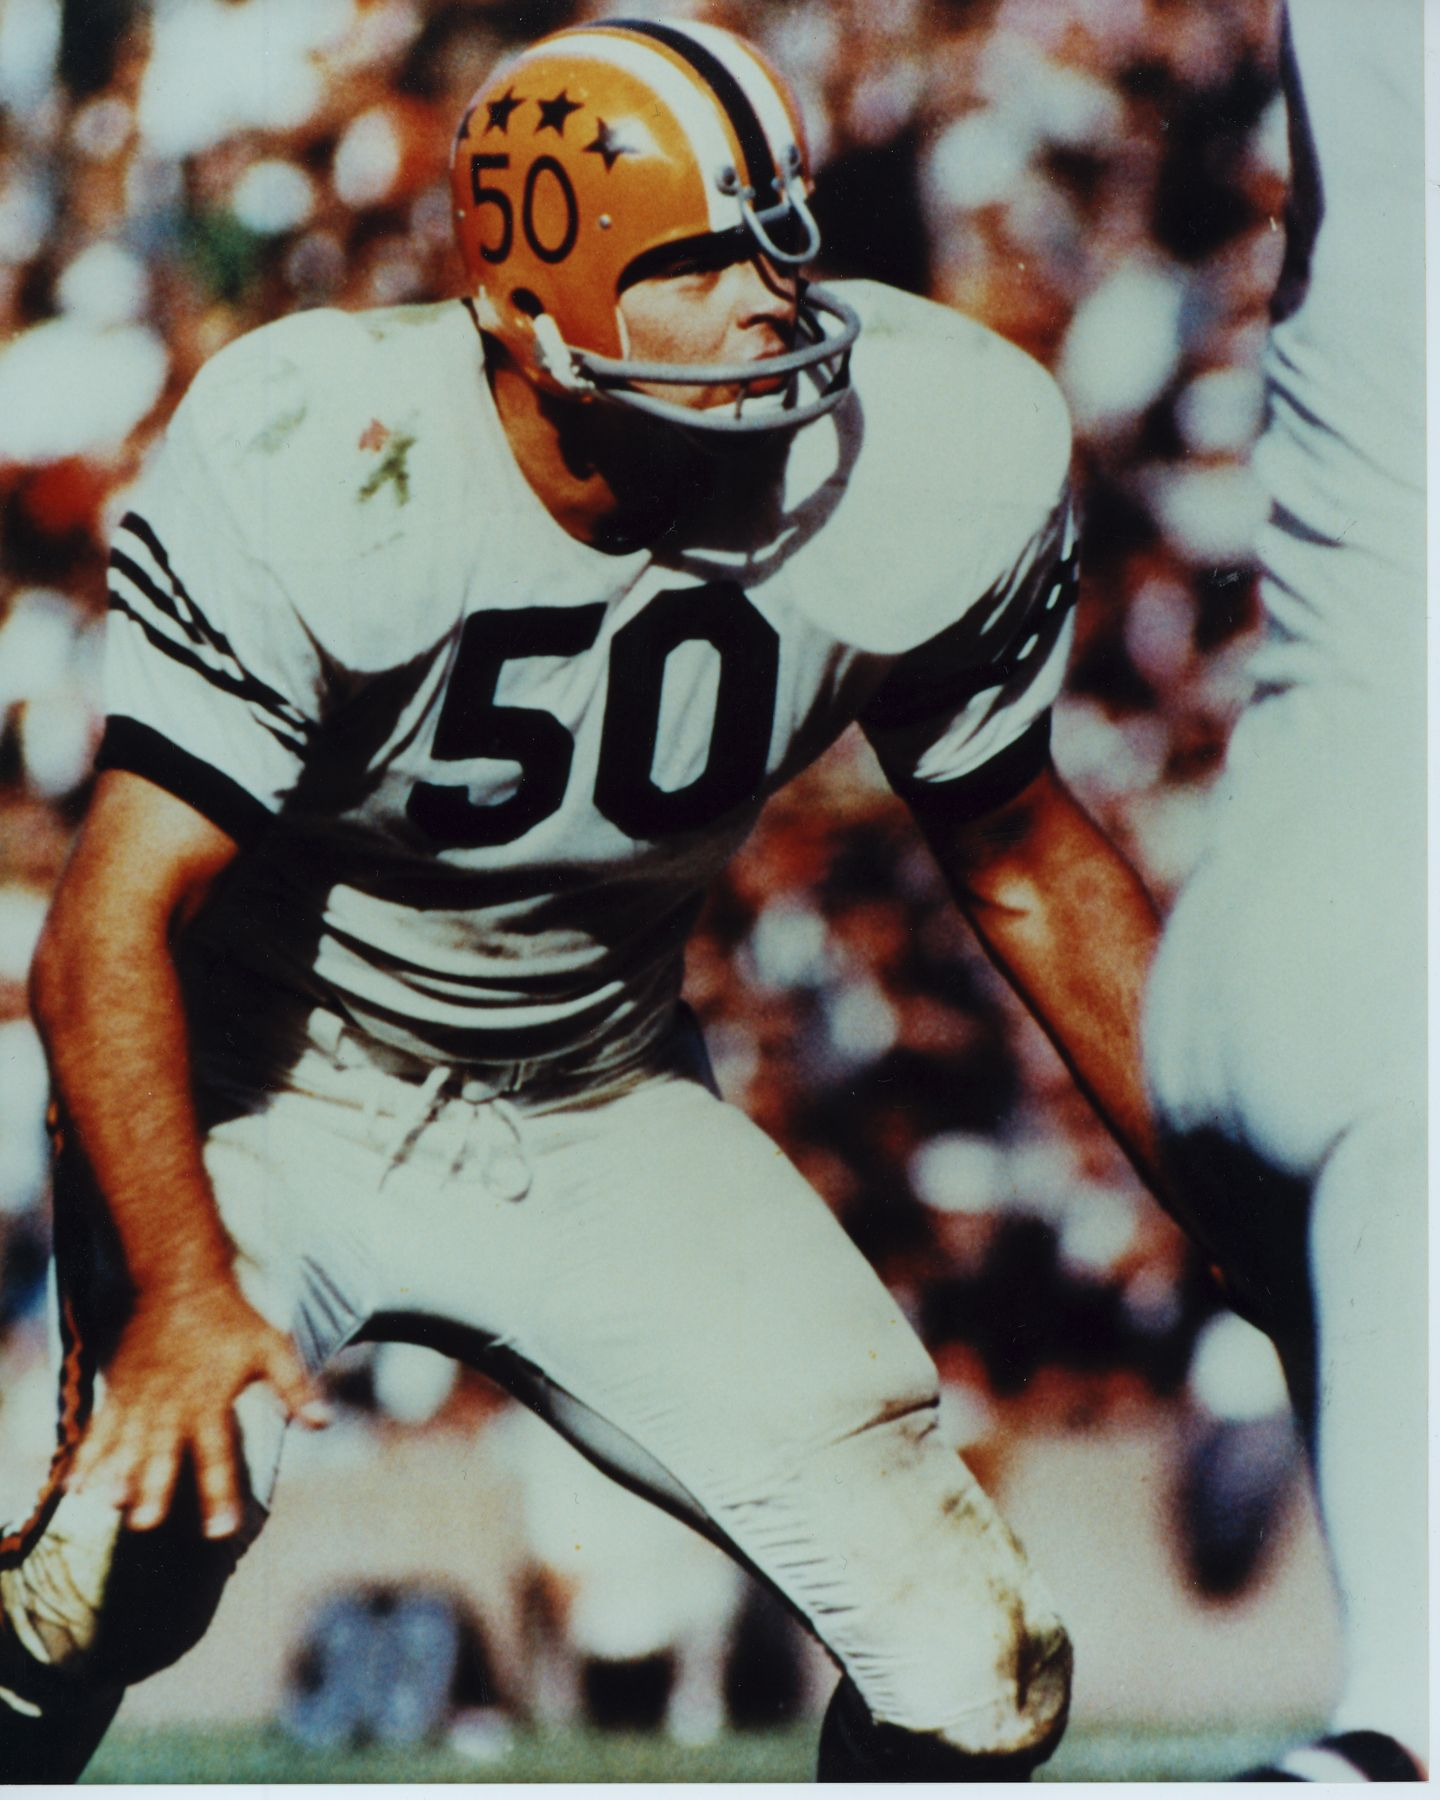 Vintage Sports Memorabilia ZACH THOMAS  DALLAS COWBOYS 8X10 SPORTS PHOTO #70 Sports Mem, Cards & Fan Shop